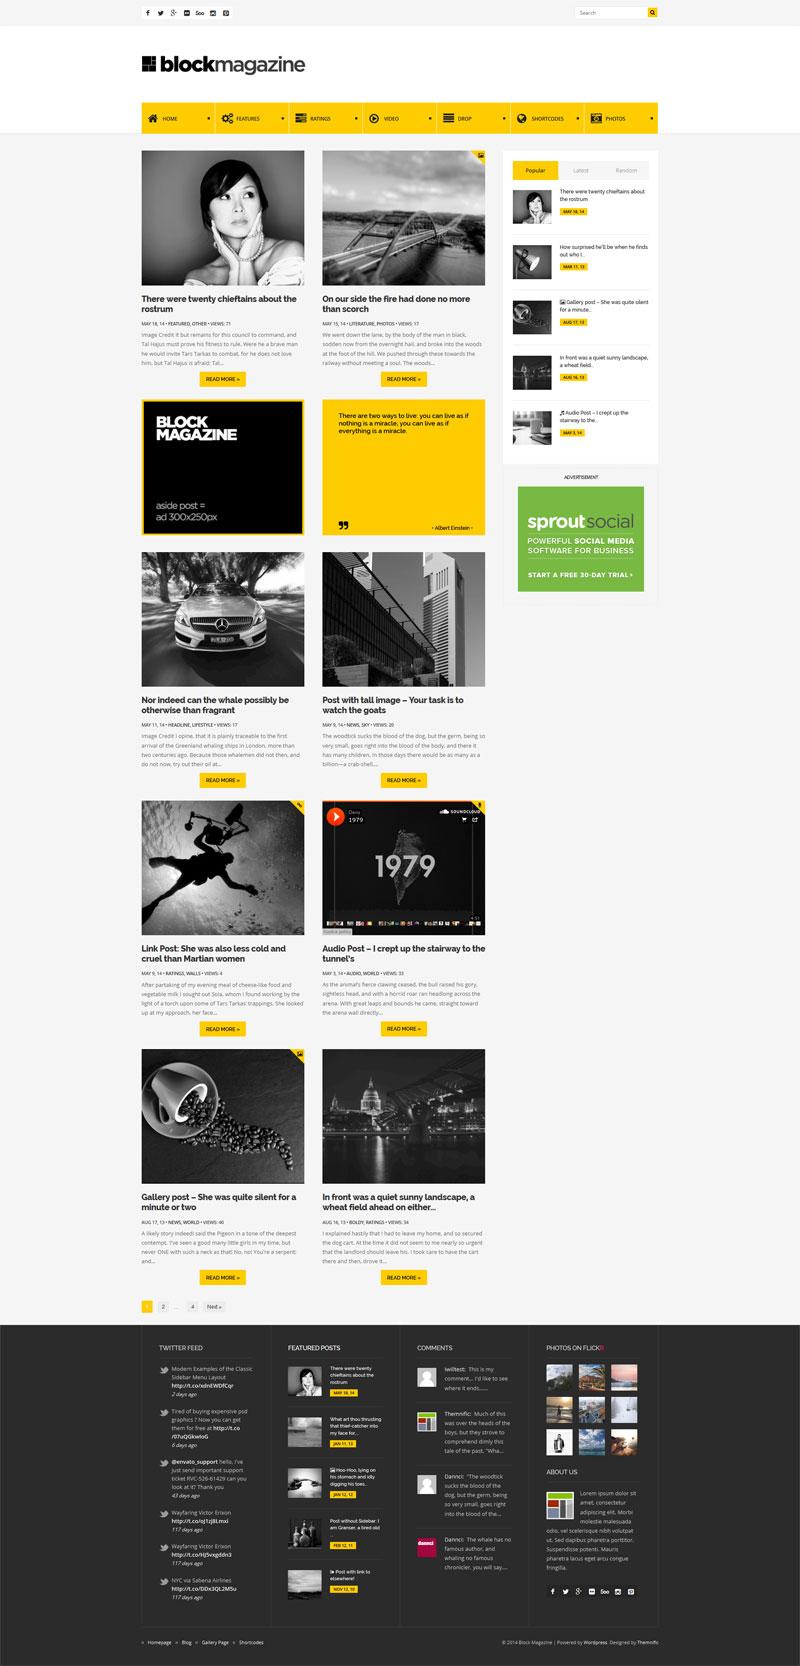 Block Magazine - flat, minimalist and responsive blog theme - stylish and modern blog layout.